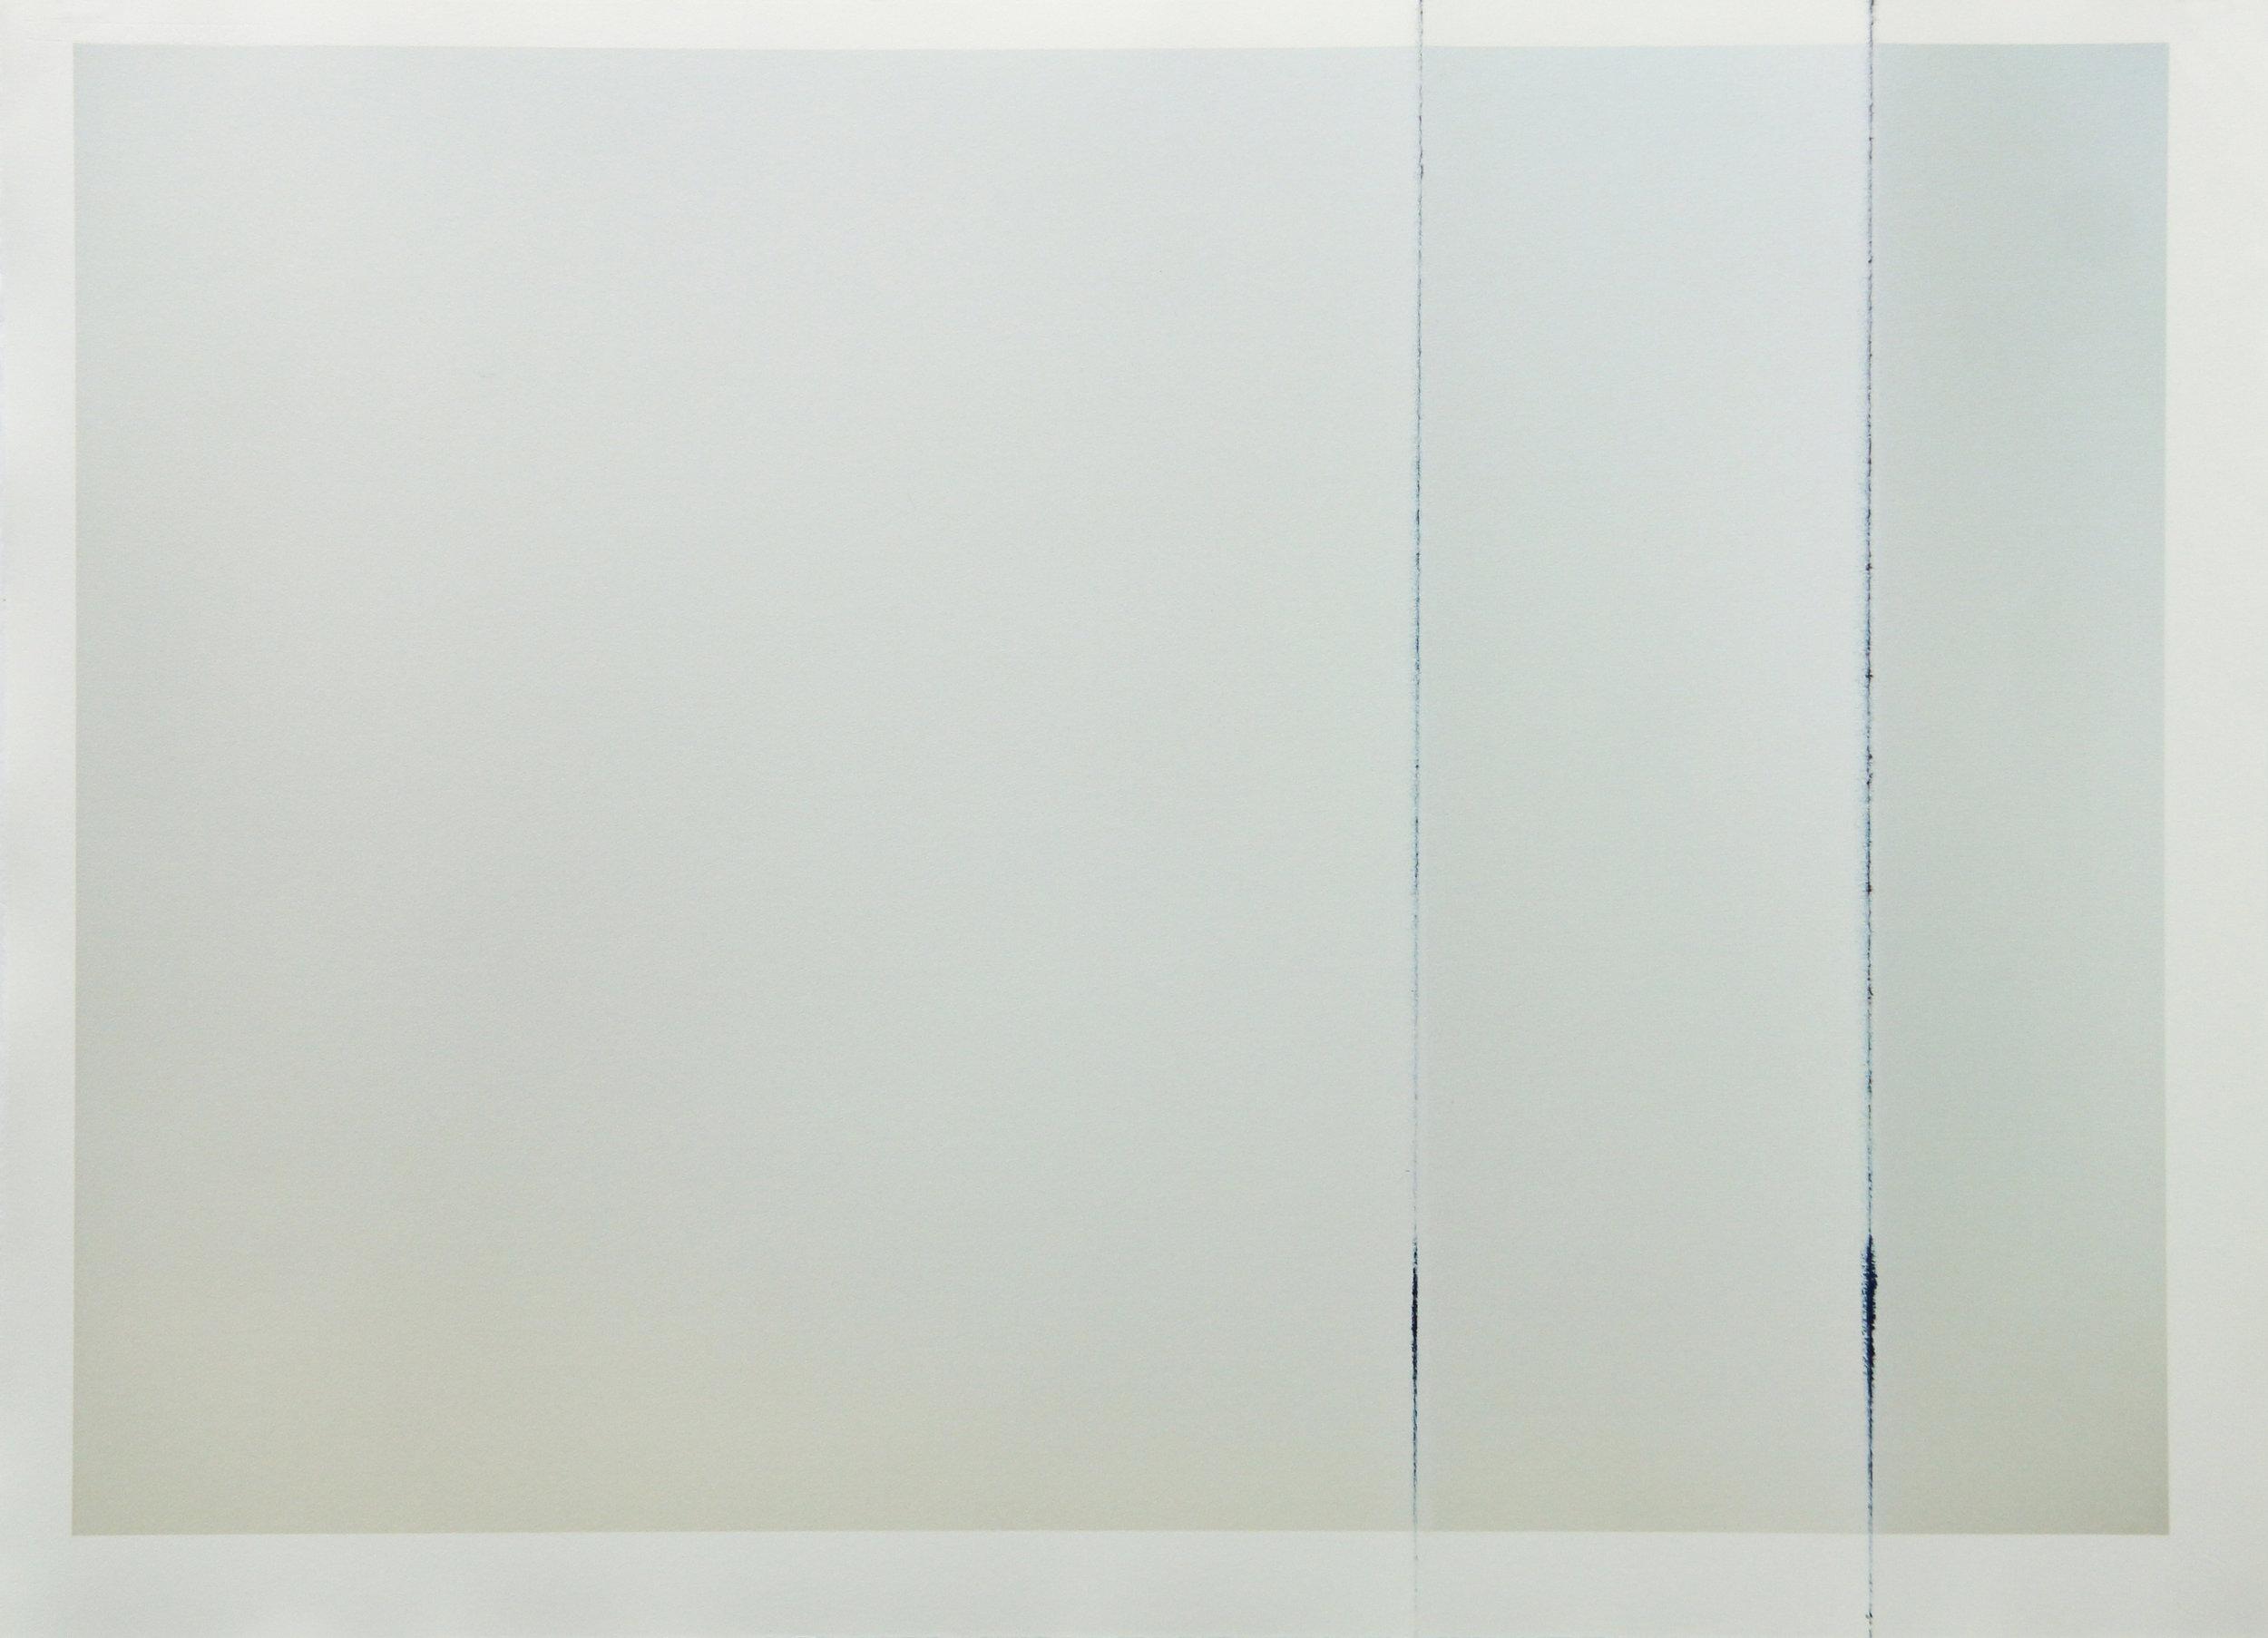 Tinted Headstrike #16, 2015 Unique giclée print, 107 x 78 cm